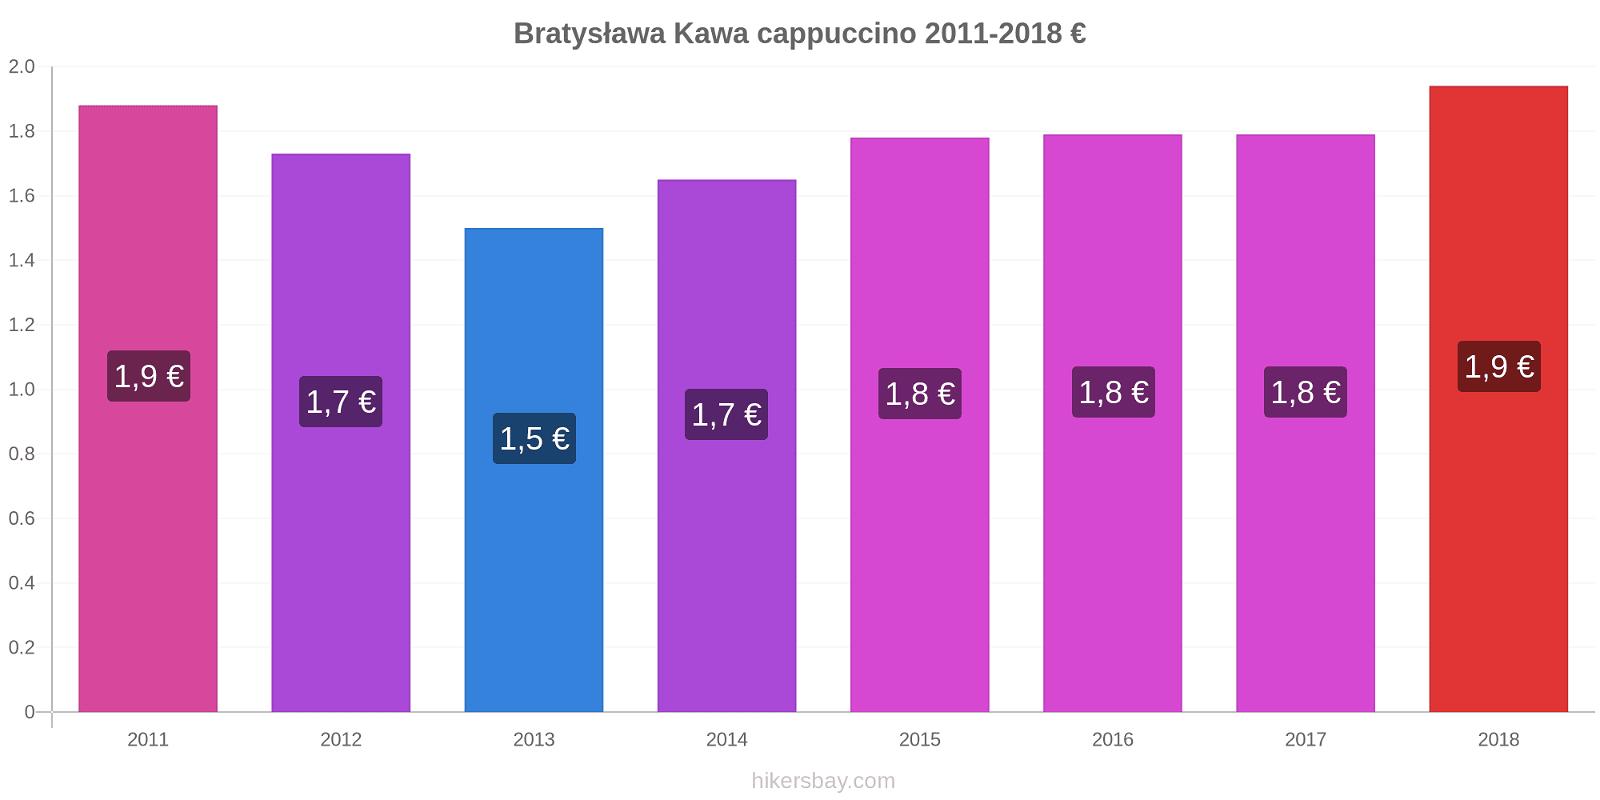 Bratysława zmiany cen Kawa cappuccino hikersbay.com